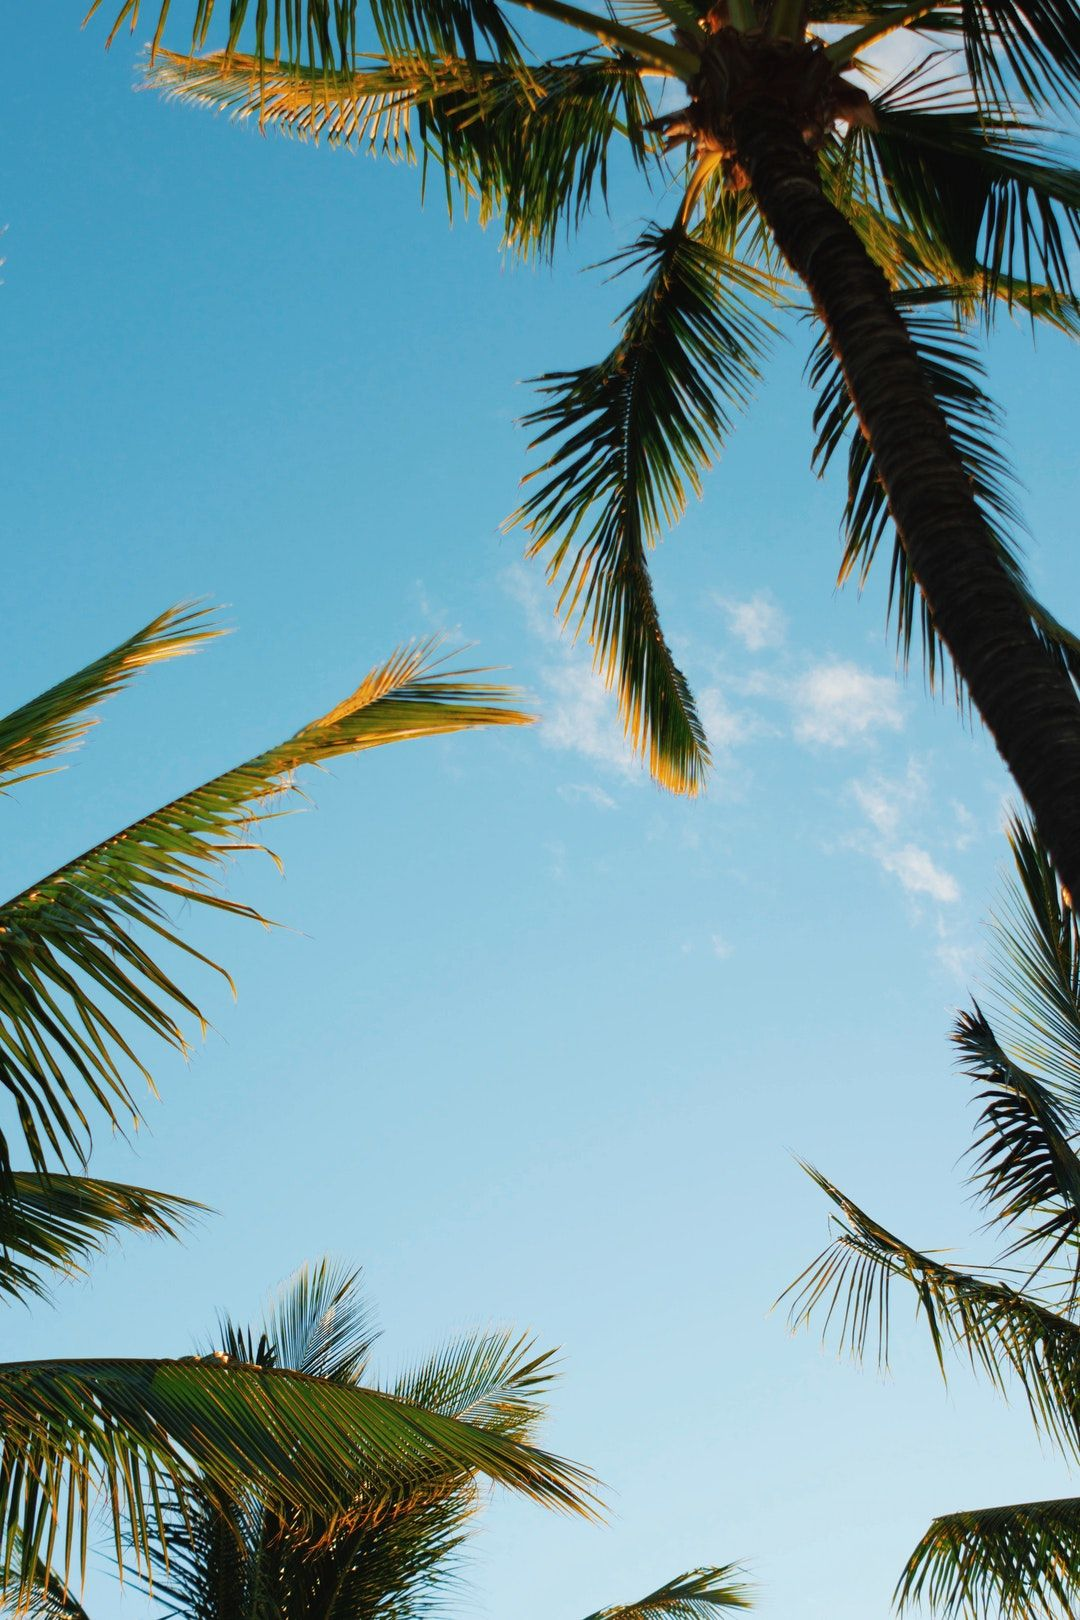 Hawaii Palm Tree Summer And Summer Vibe Hd Photo By Jordan Mcqueen Jordanfmcqueen On Unspla Tropical Wallpaper Wallpaper Iphone Summer Tropical Background